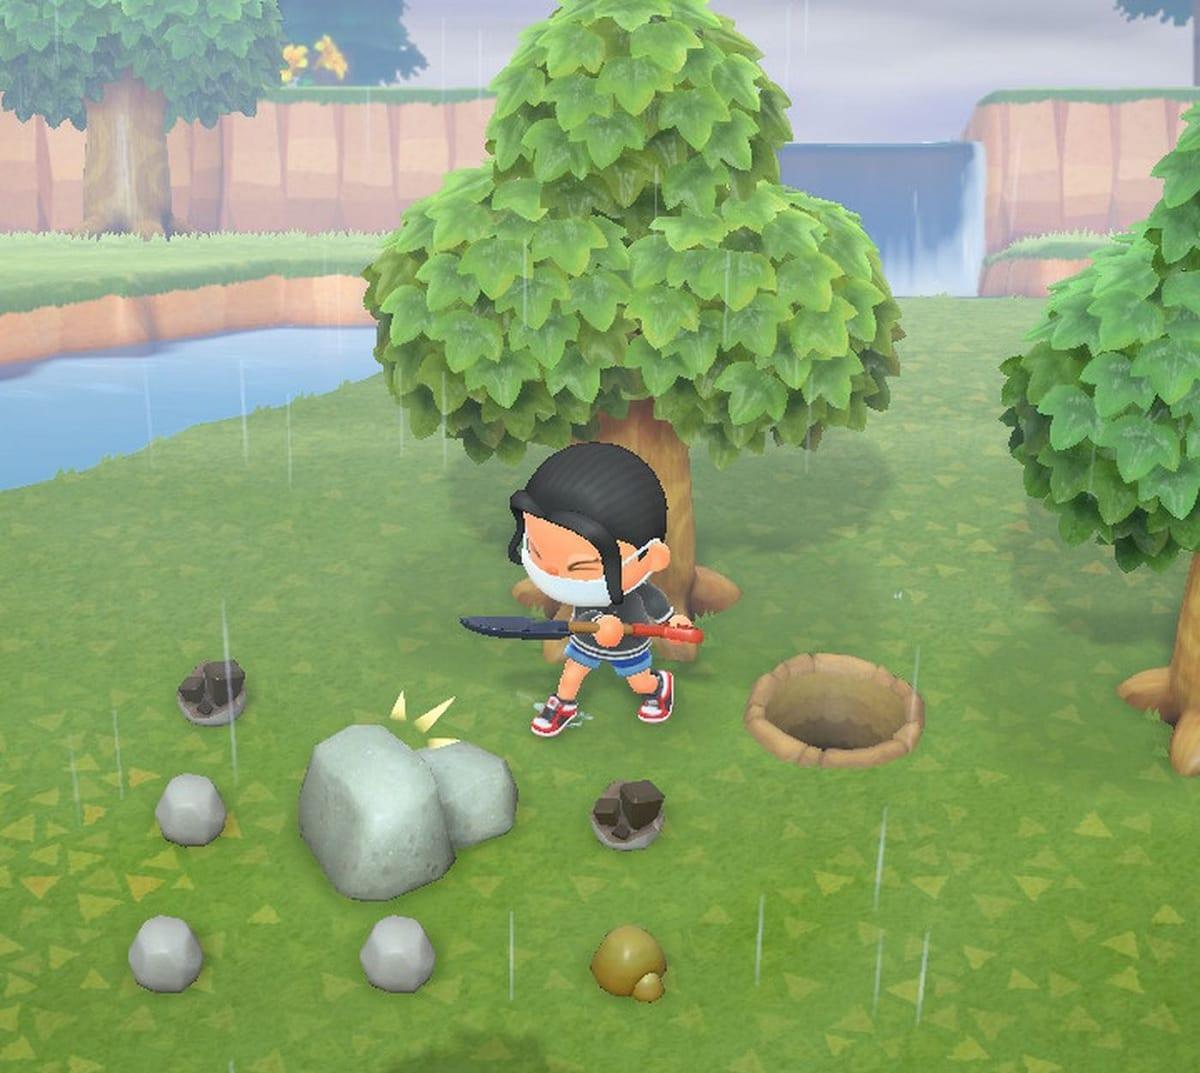 Animal Crossing New Horizons rocas con bayas